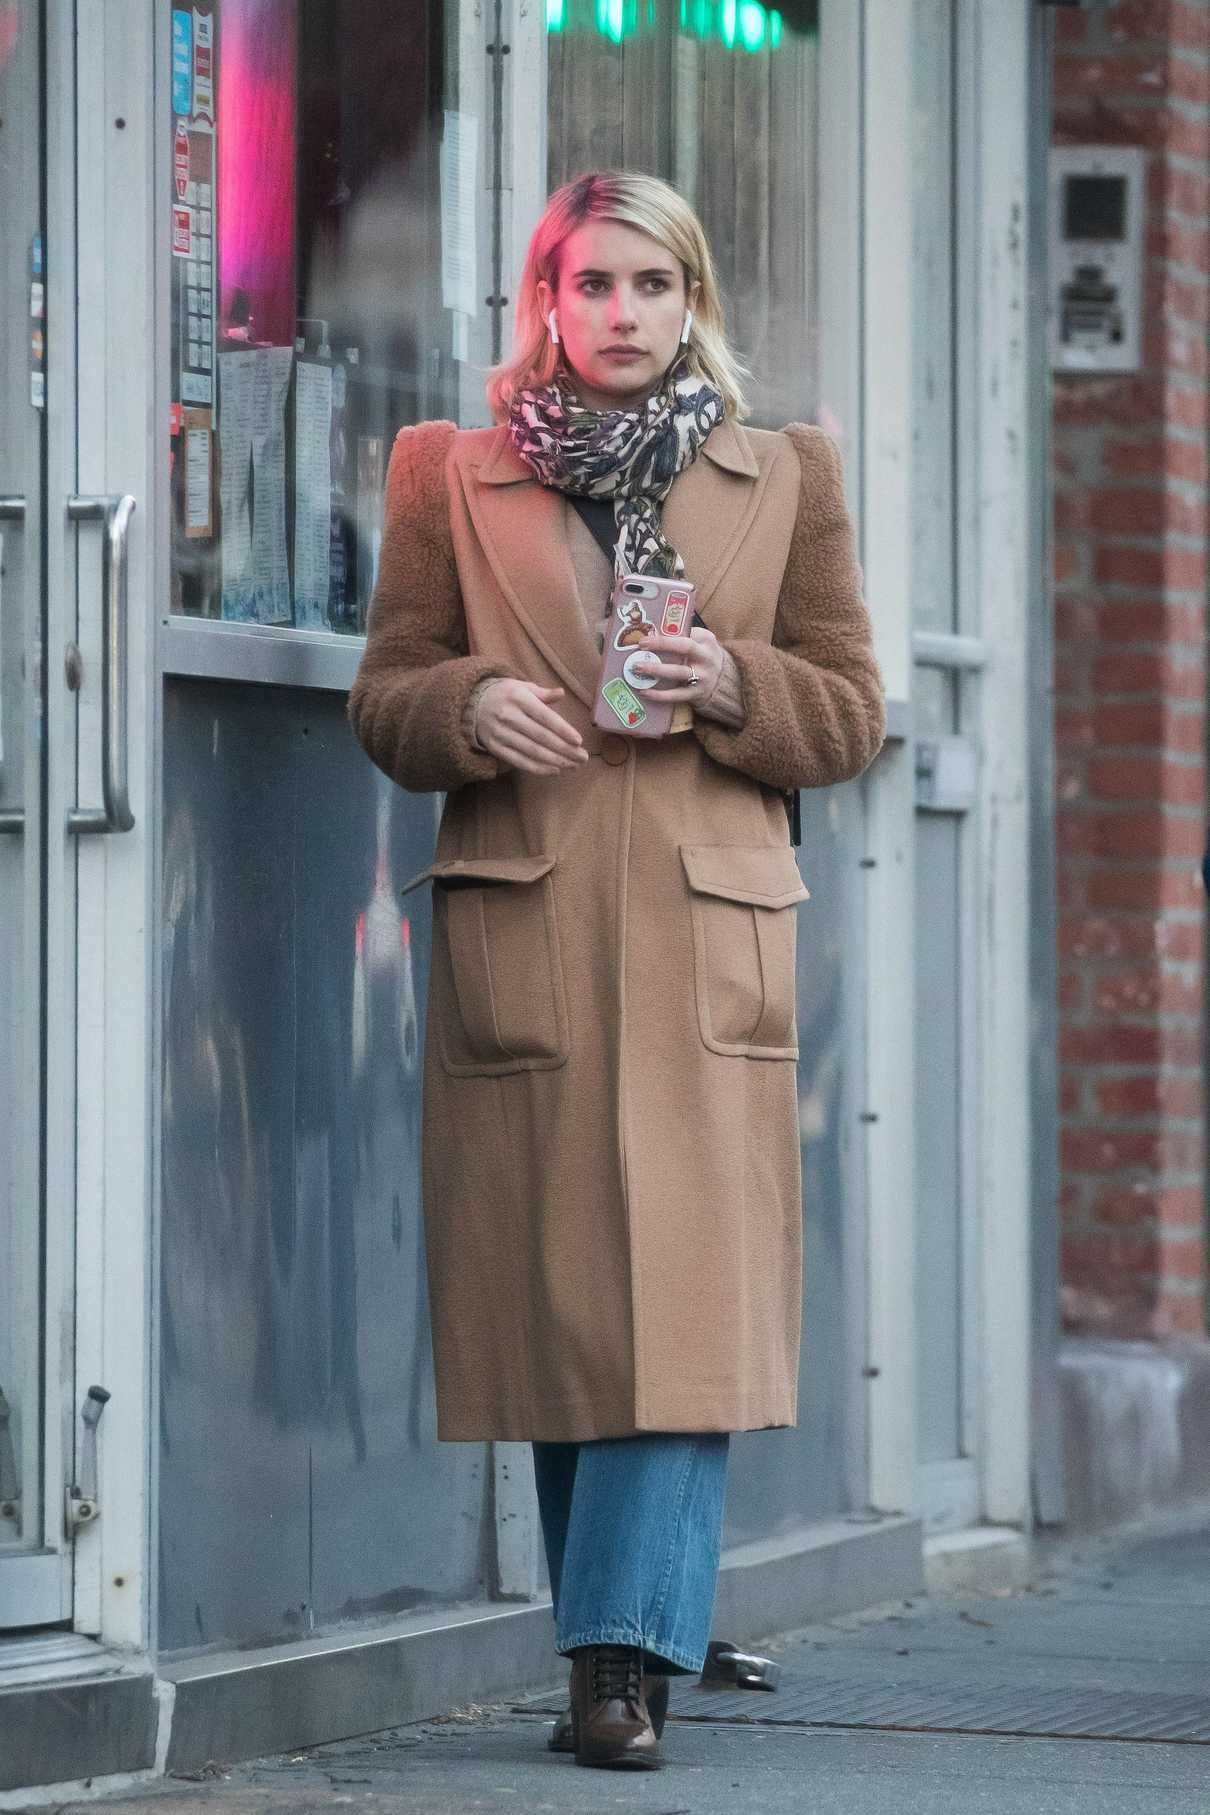 Emma Roberts in a Beige Coat